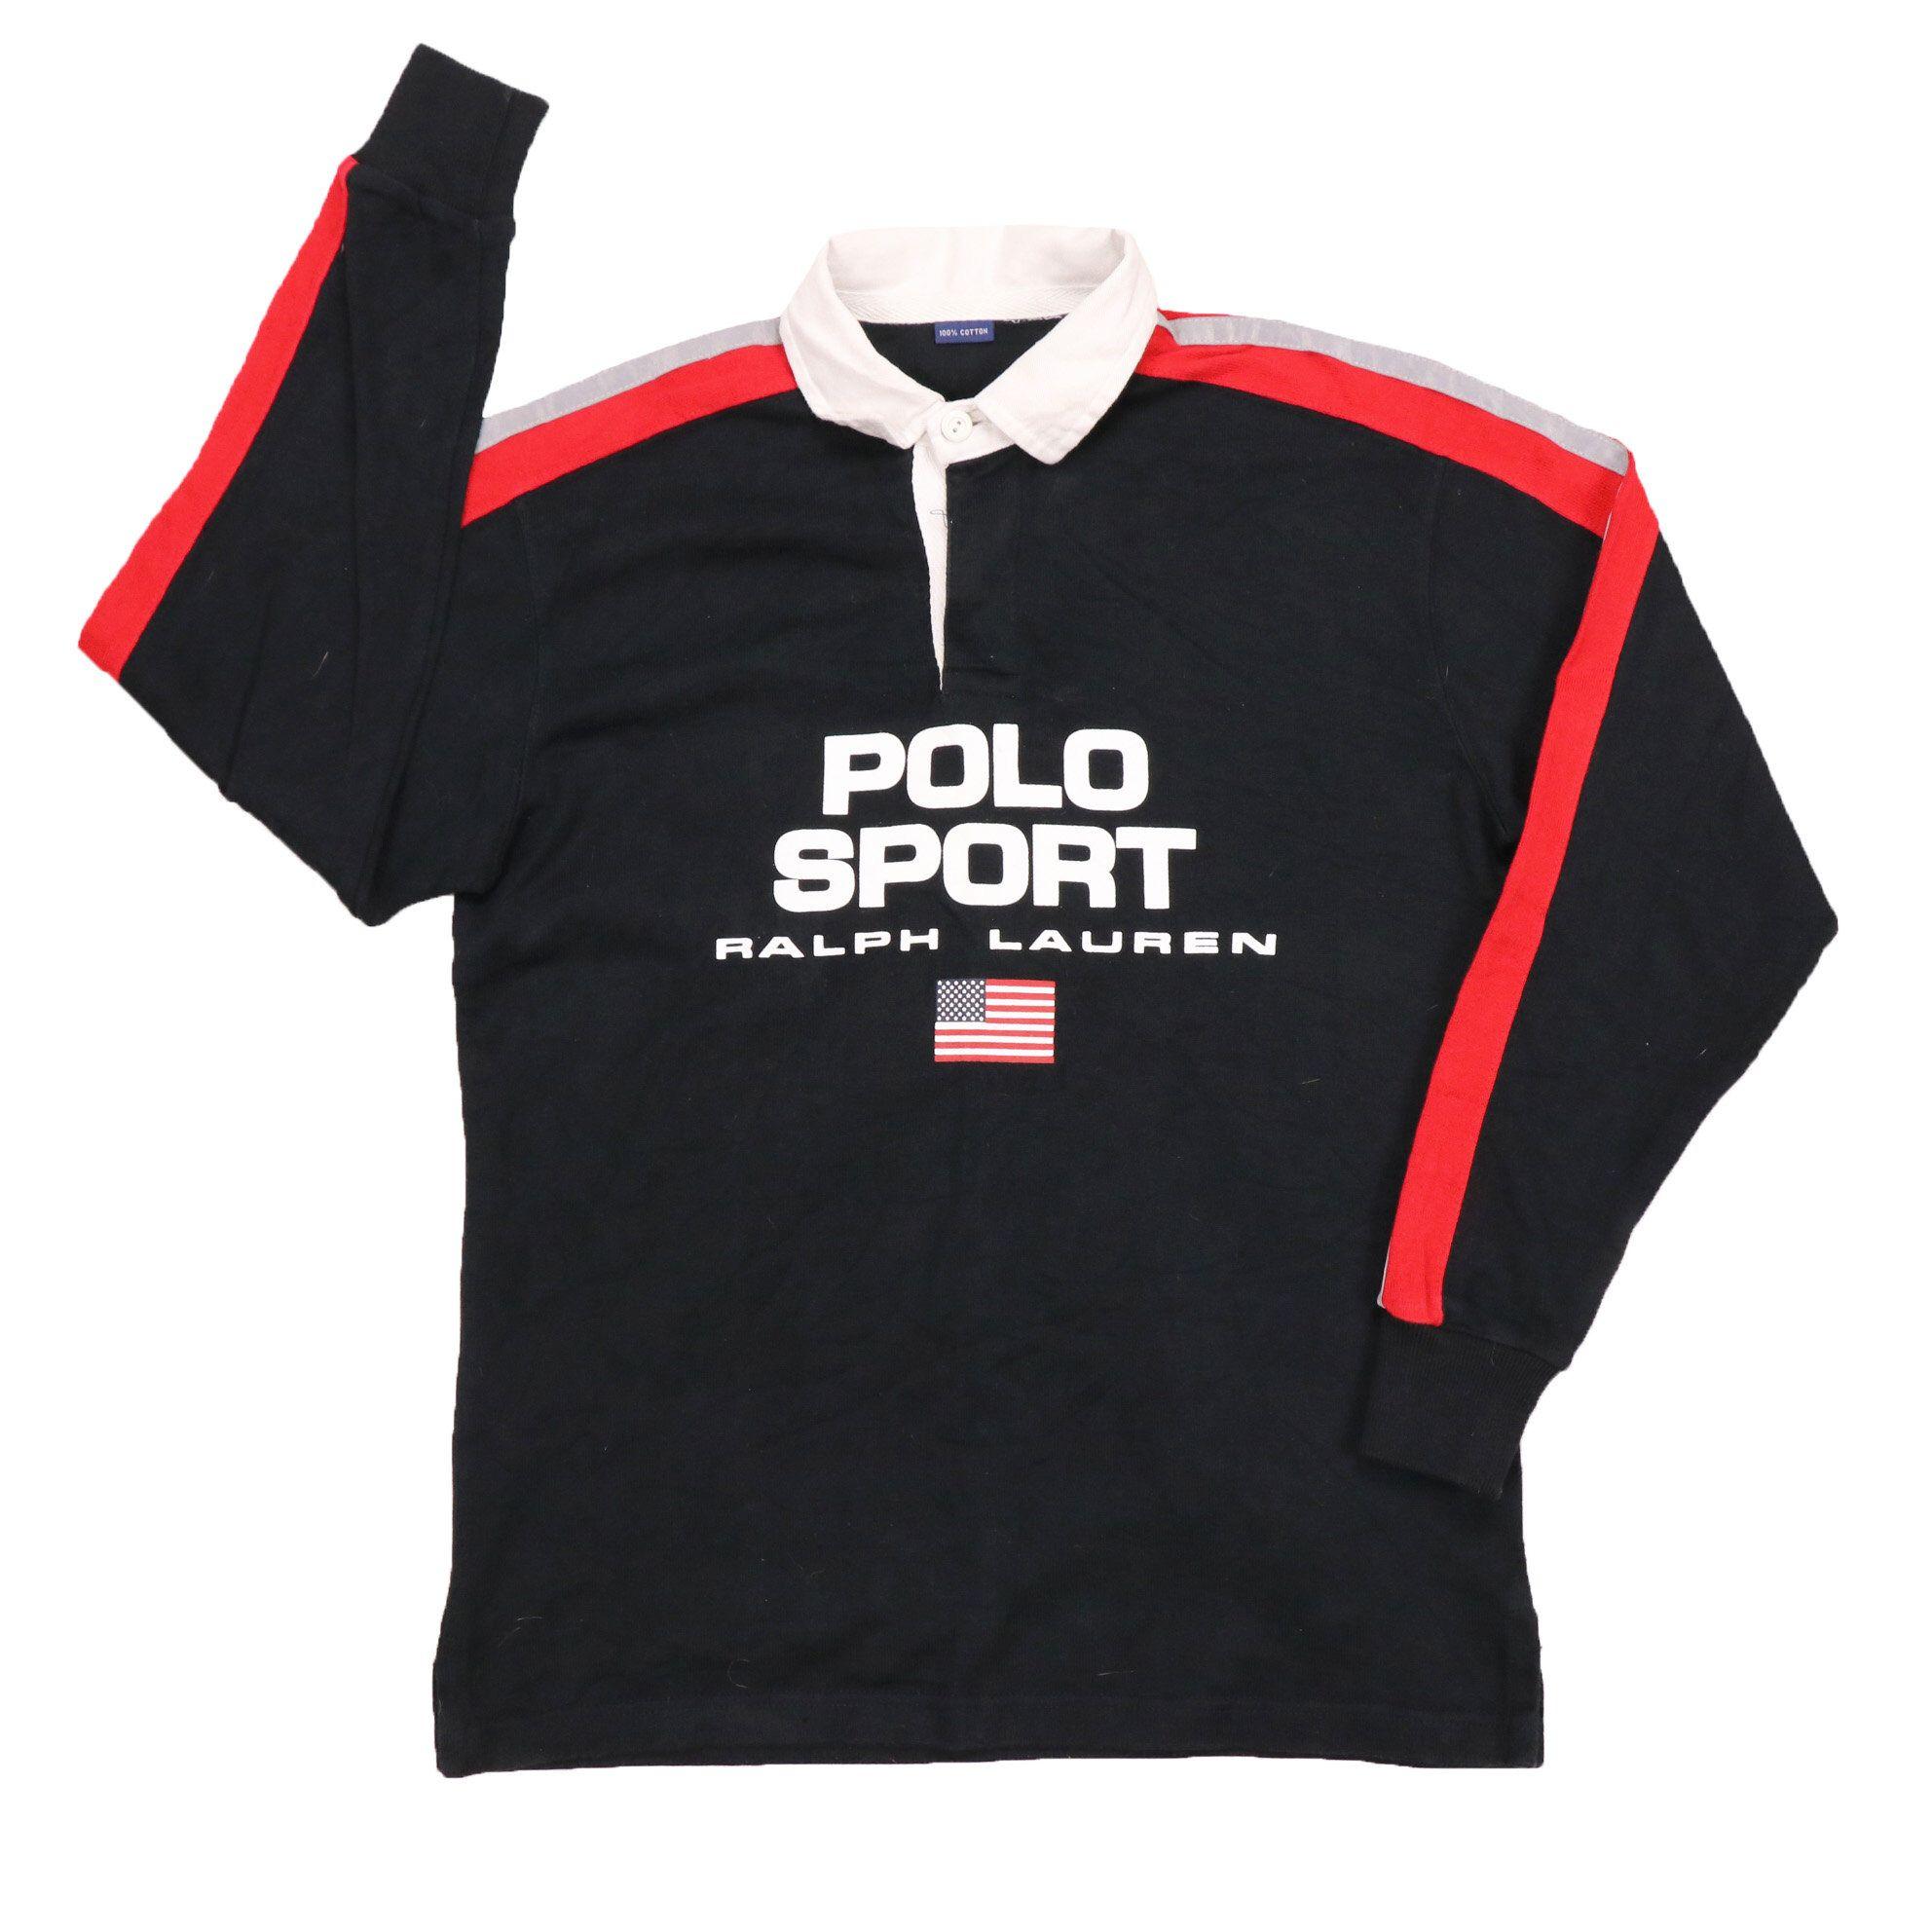 Vintage 90s polo Sport Ralph Lauren rugby